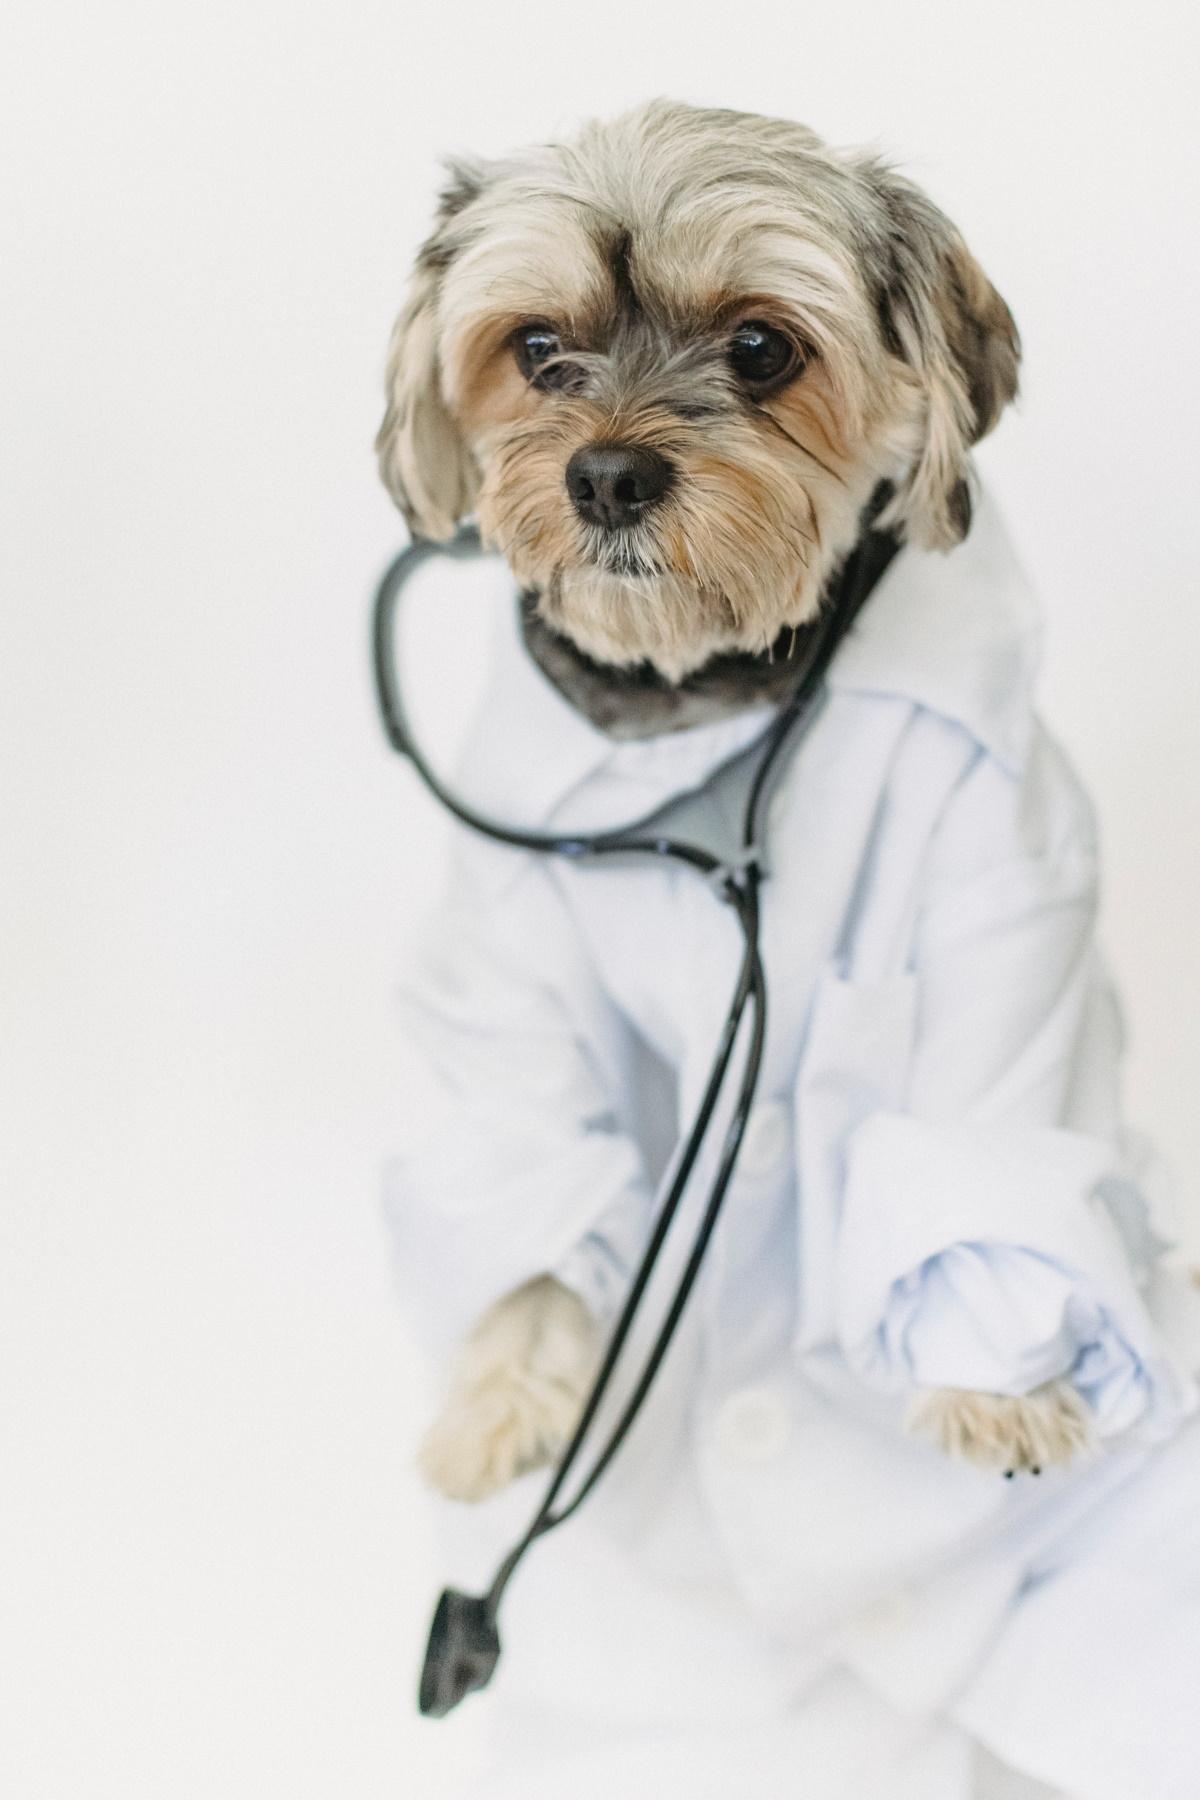 Dog wearing a medic costume